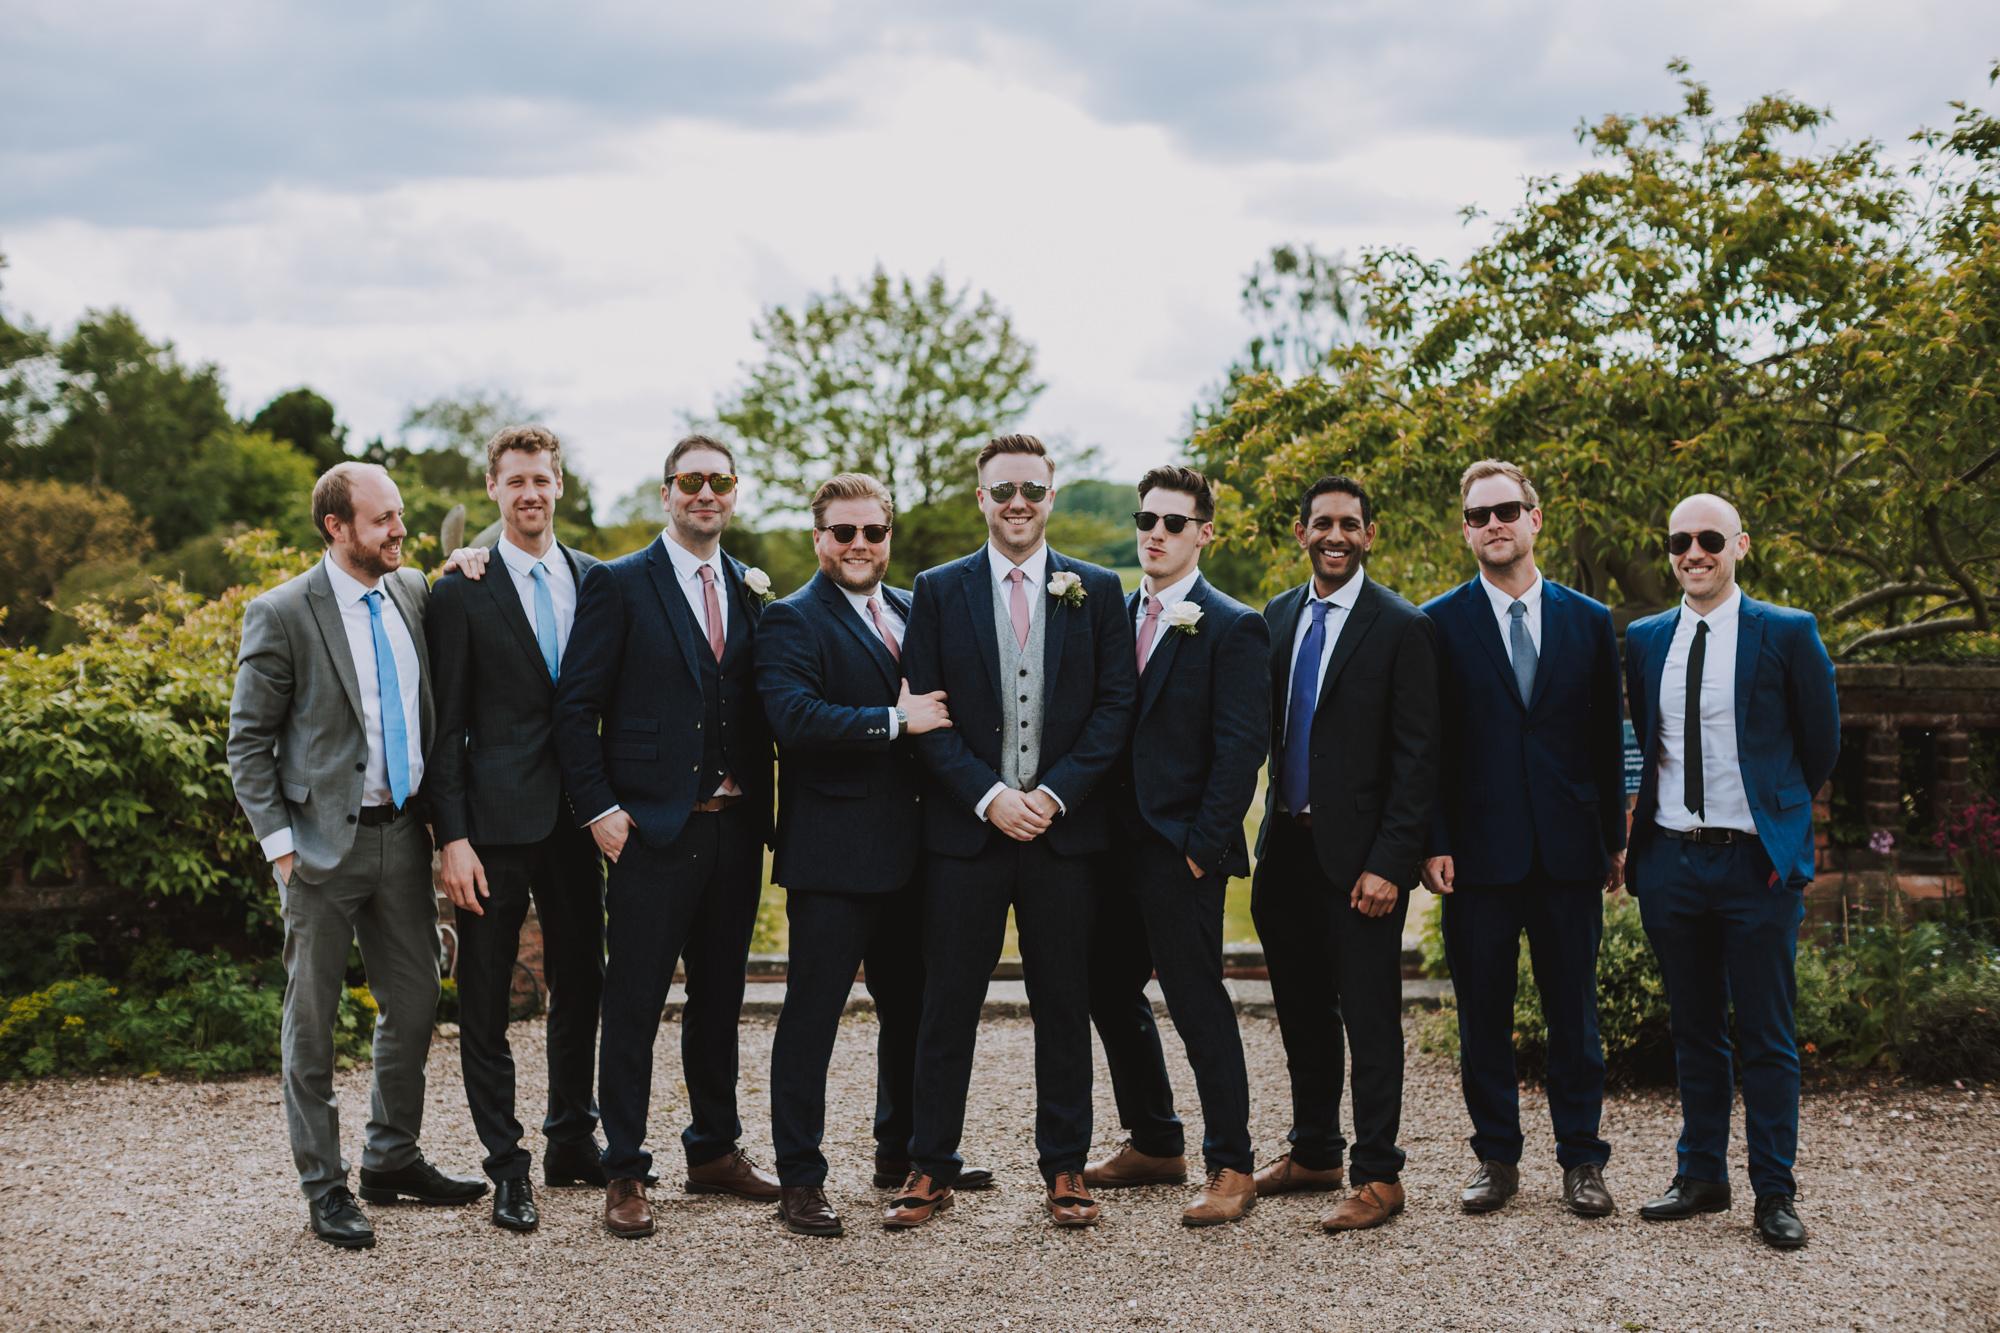 hodsock priory wedding photographers blog51.jpg